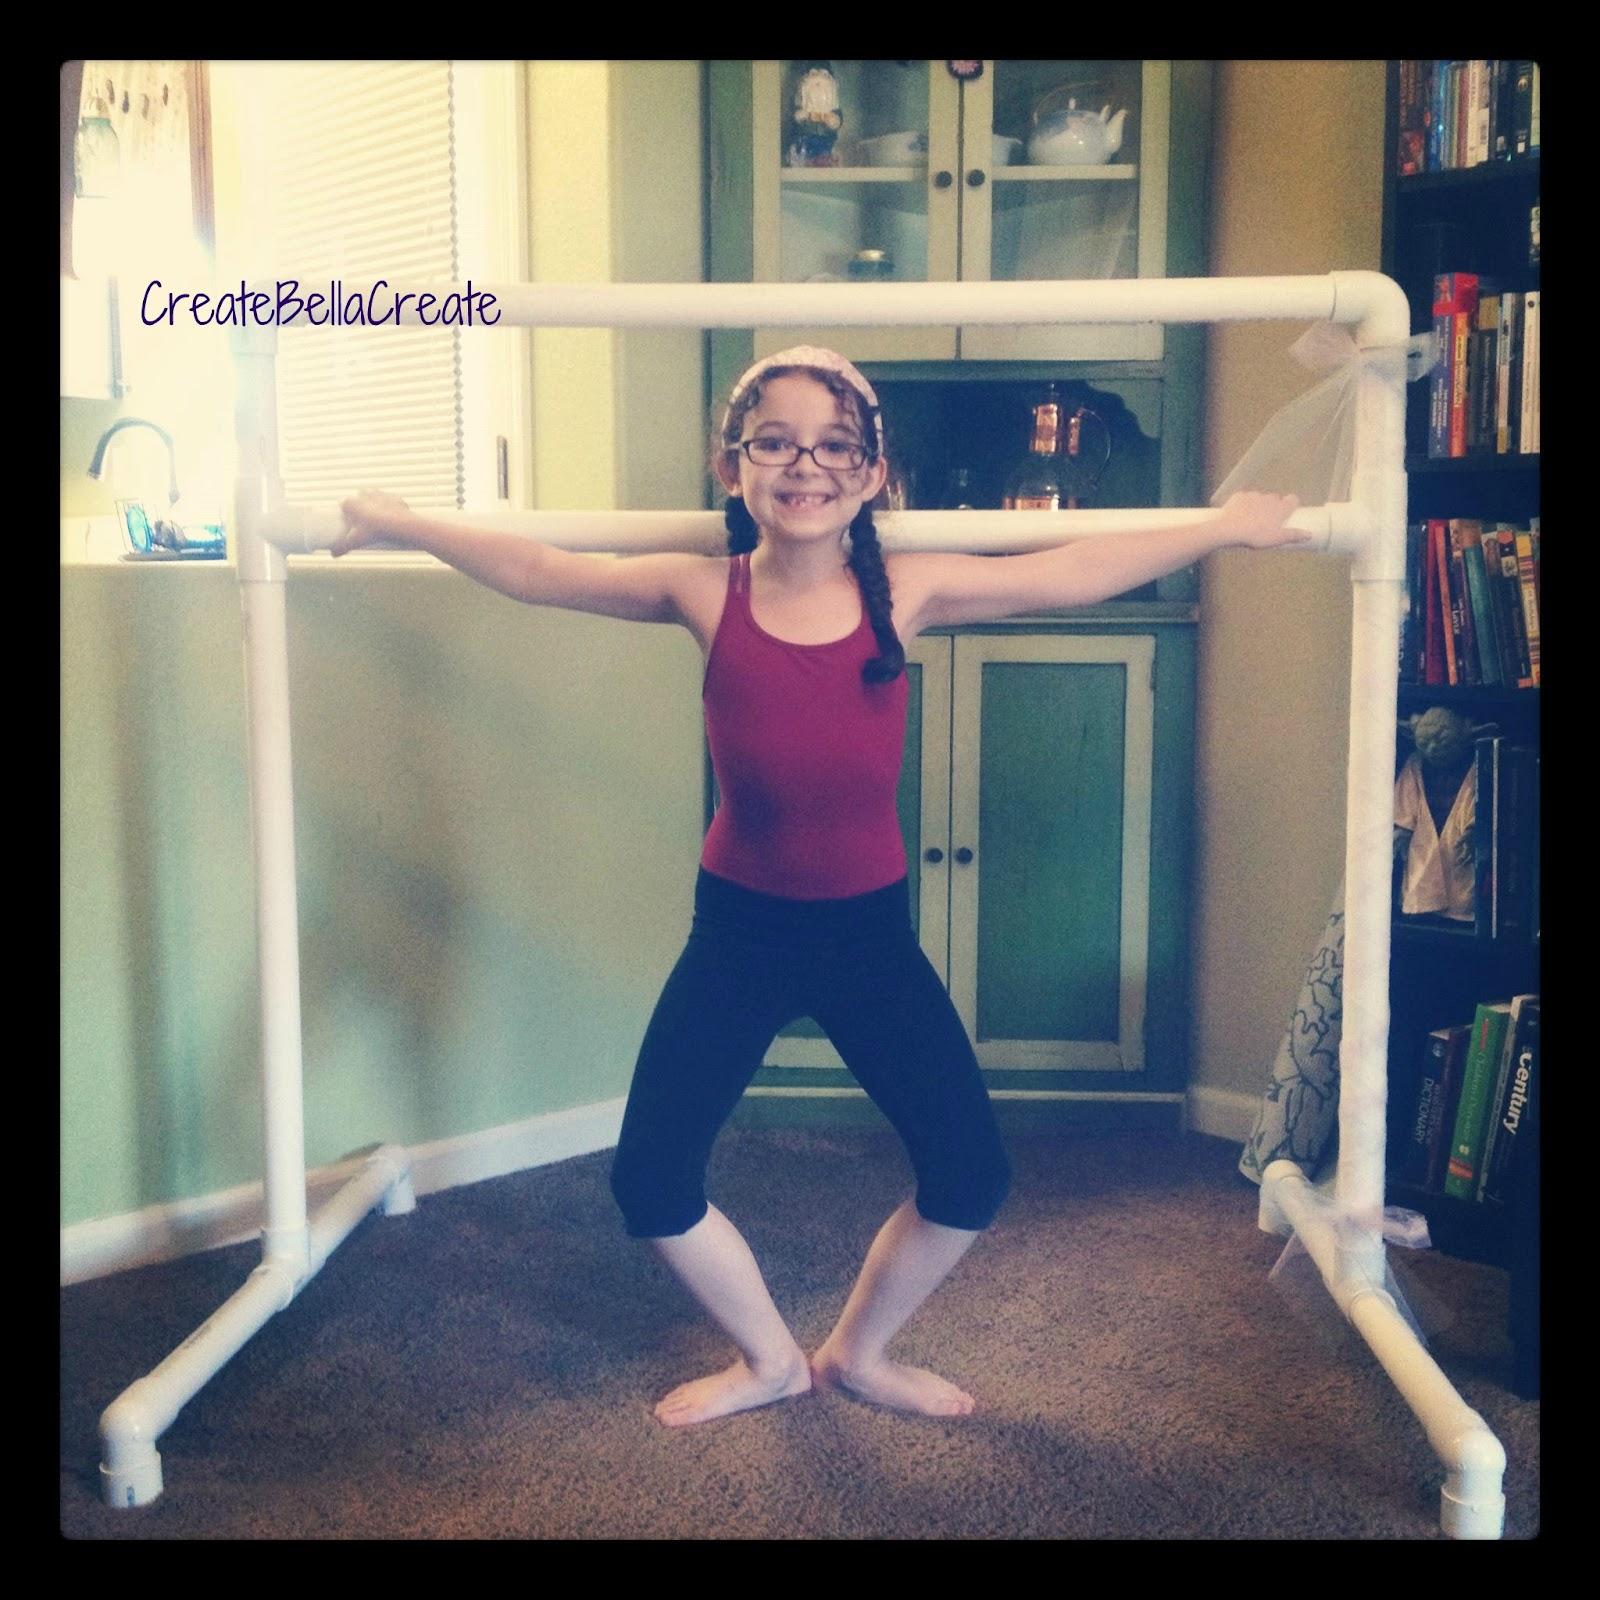 createbellacreate: DIY Tutorial Free Standing Ballet Barre ...